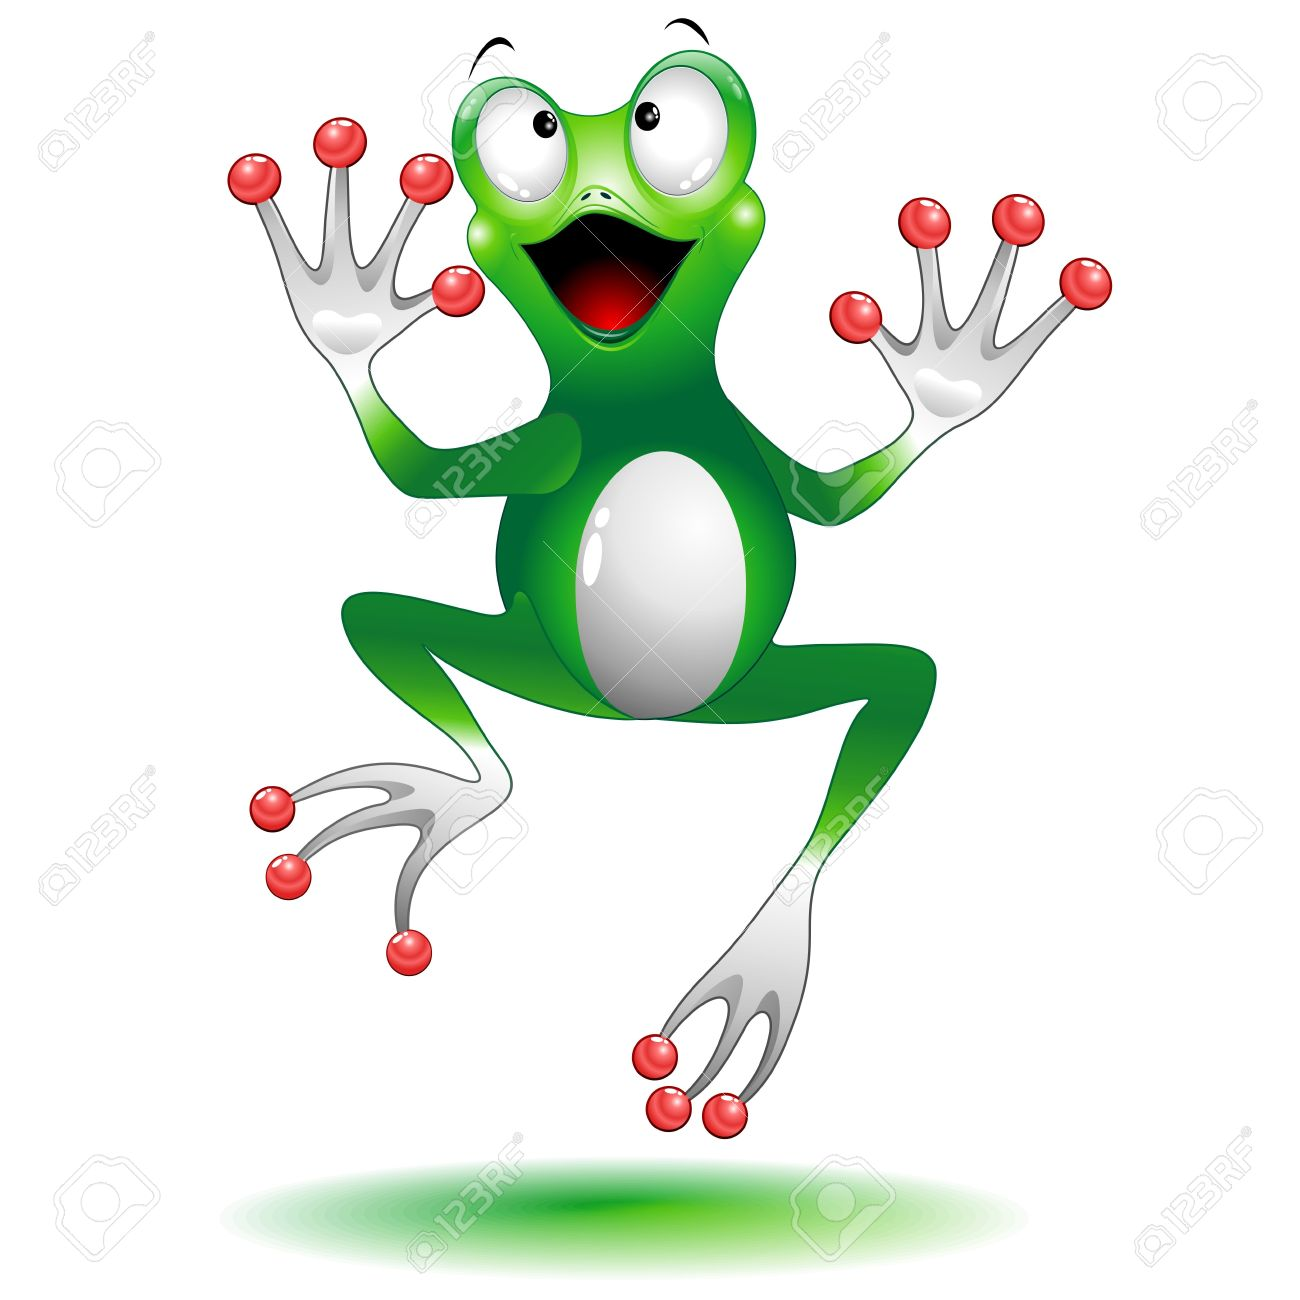 Happy Jumping Frog Cartoon Character Stock Vector - 18587241